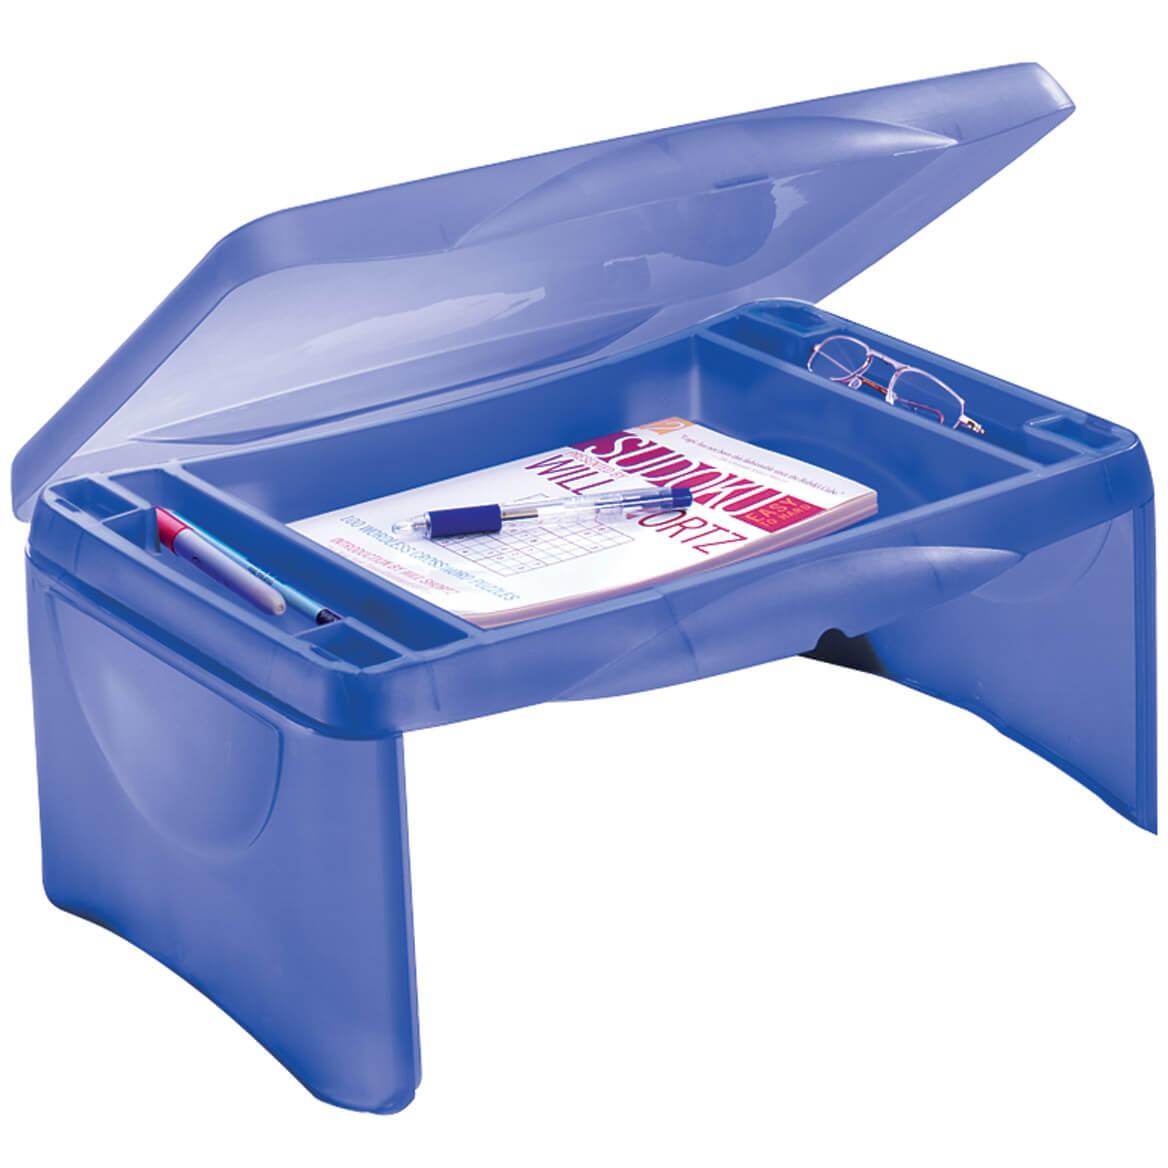 Storage Folding Lap Desk